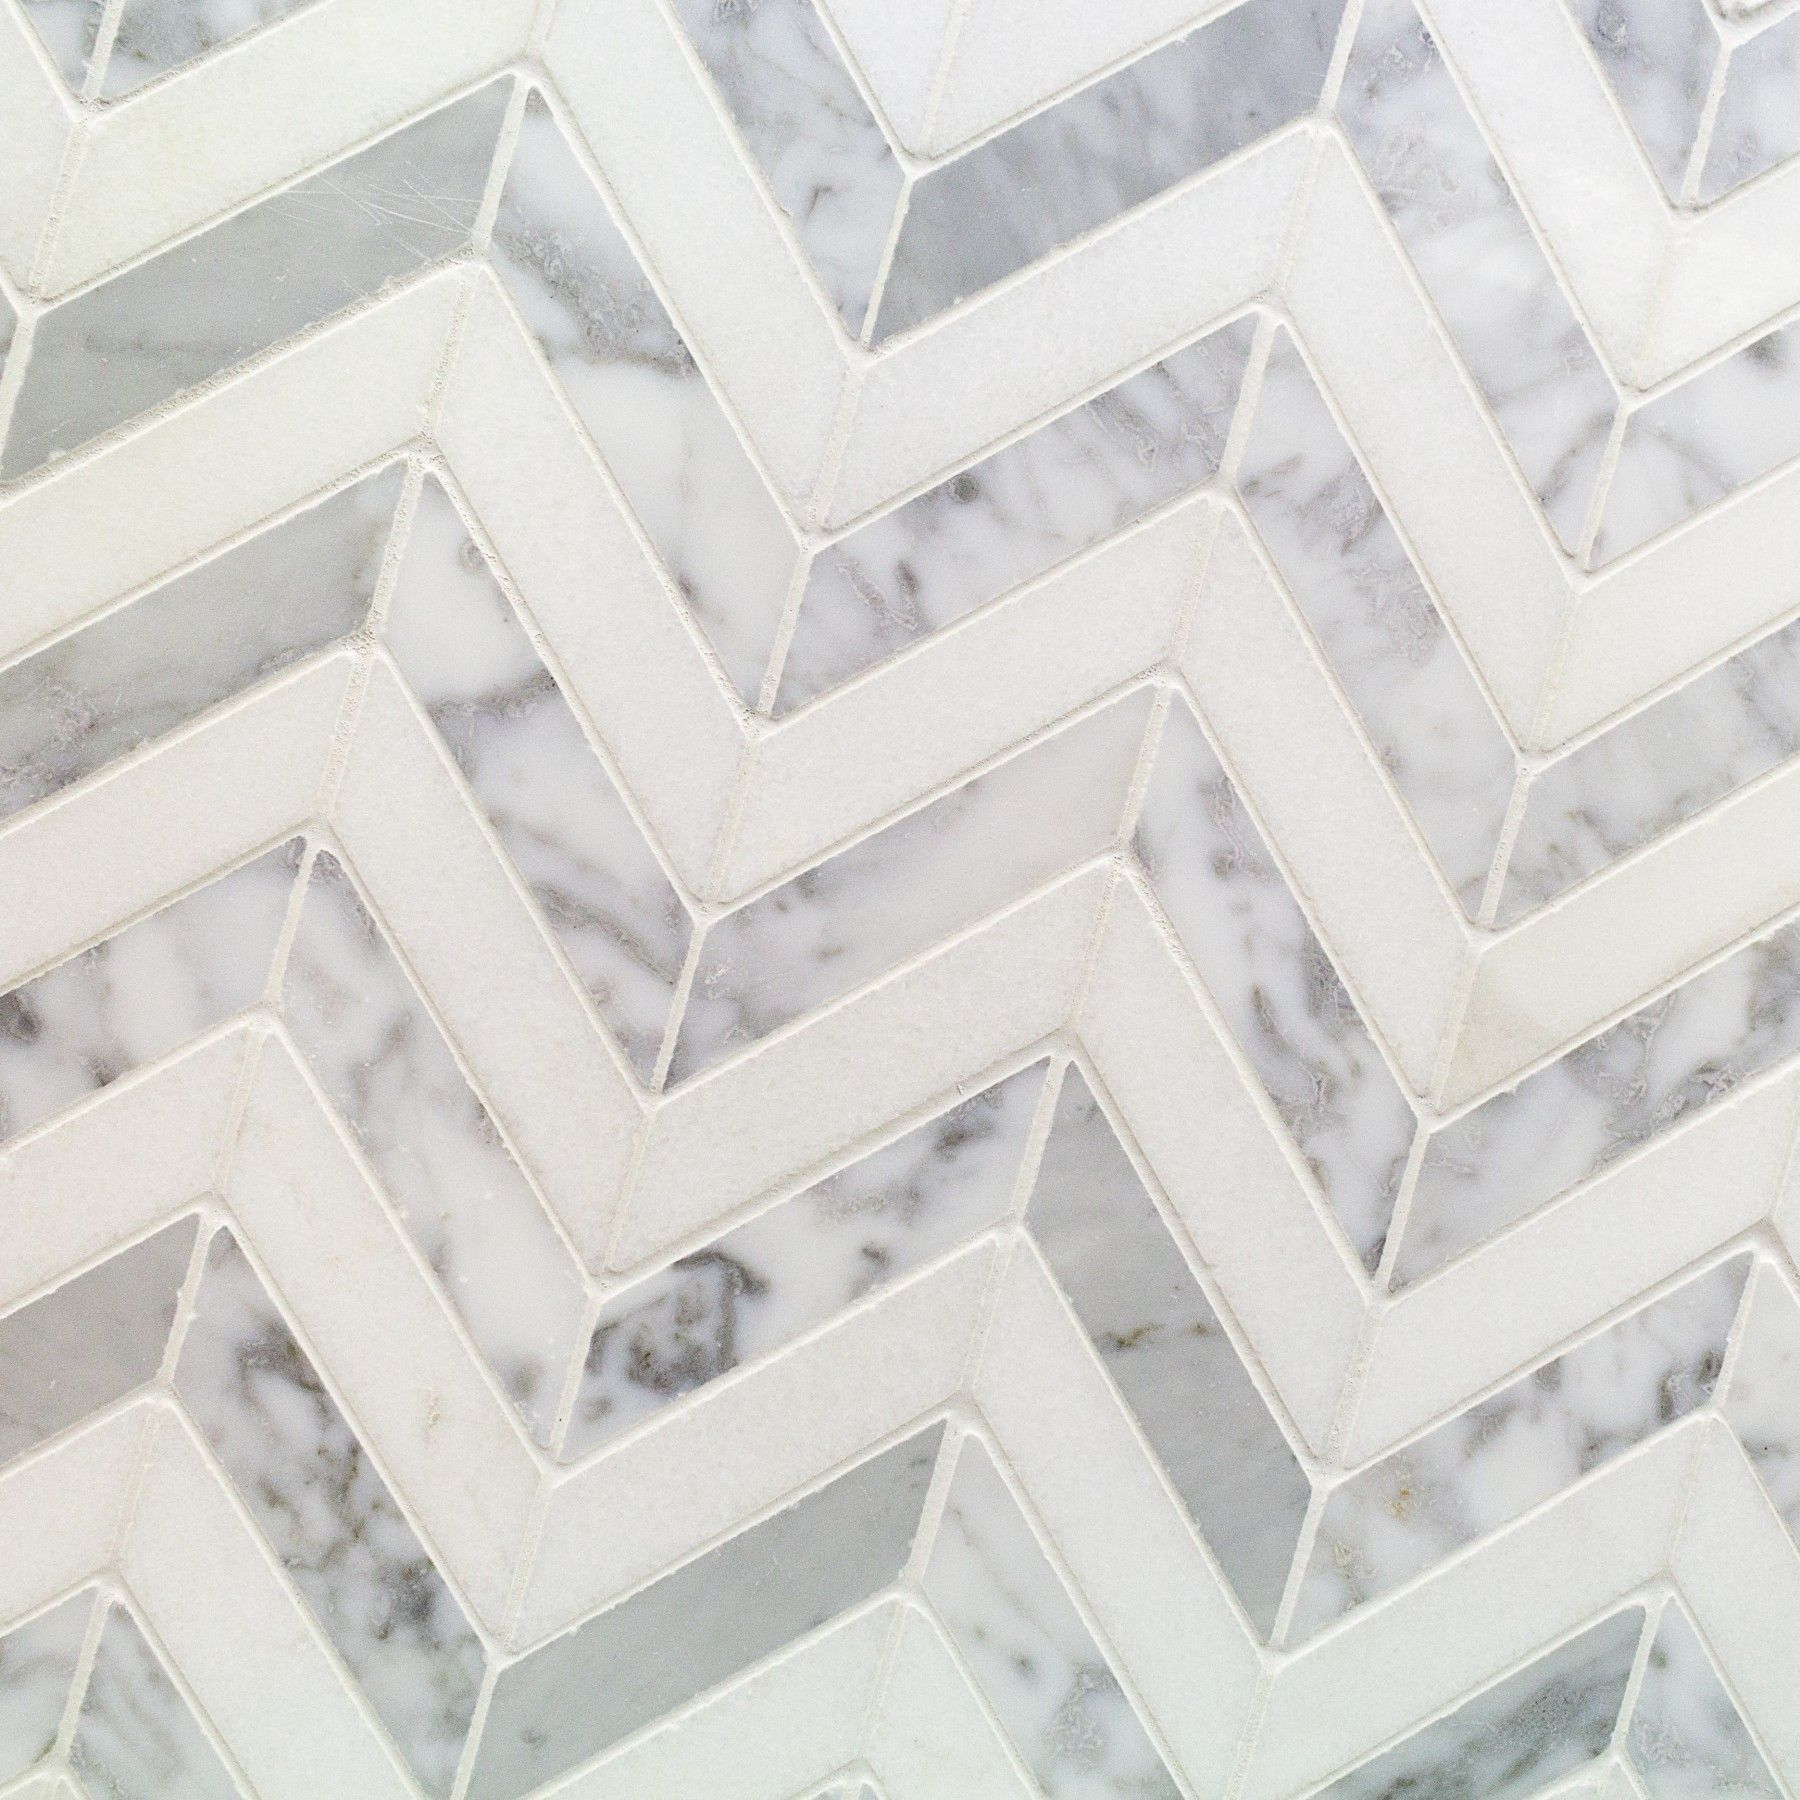 Talon white carrera and thassos marble tile ideas for the house talon white carrera and thassos marble tile ideas for the house pinterest marble tiles marbles and carrara tyukafo